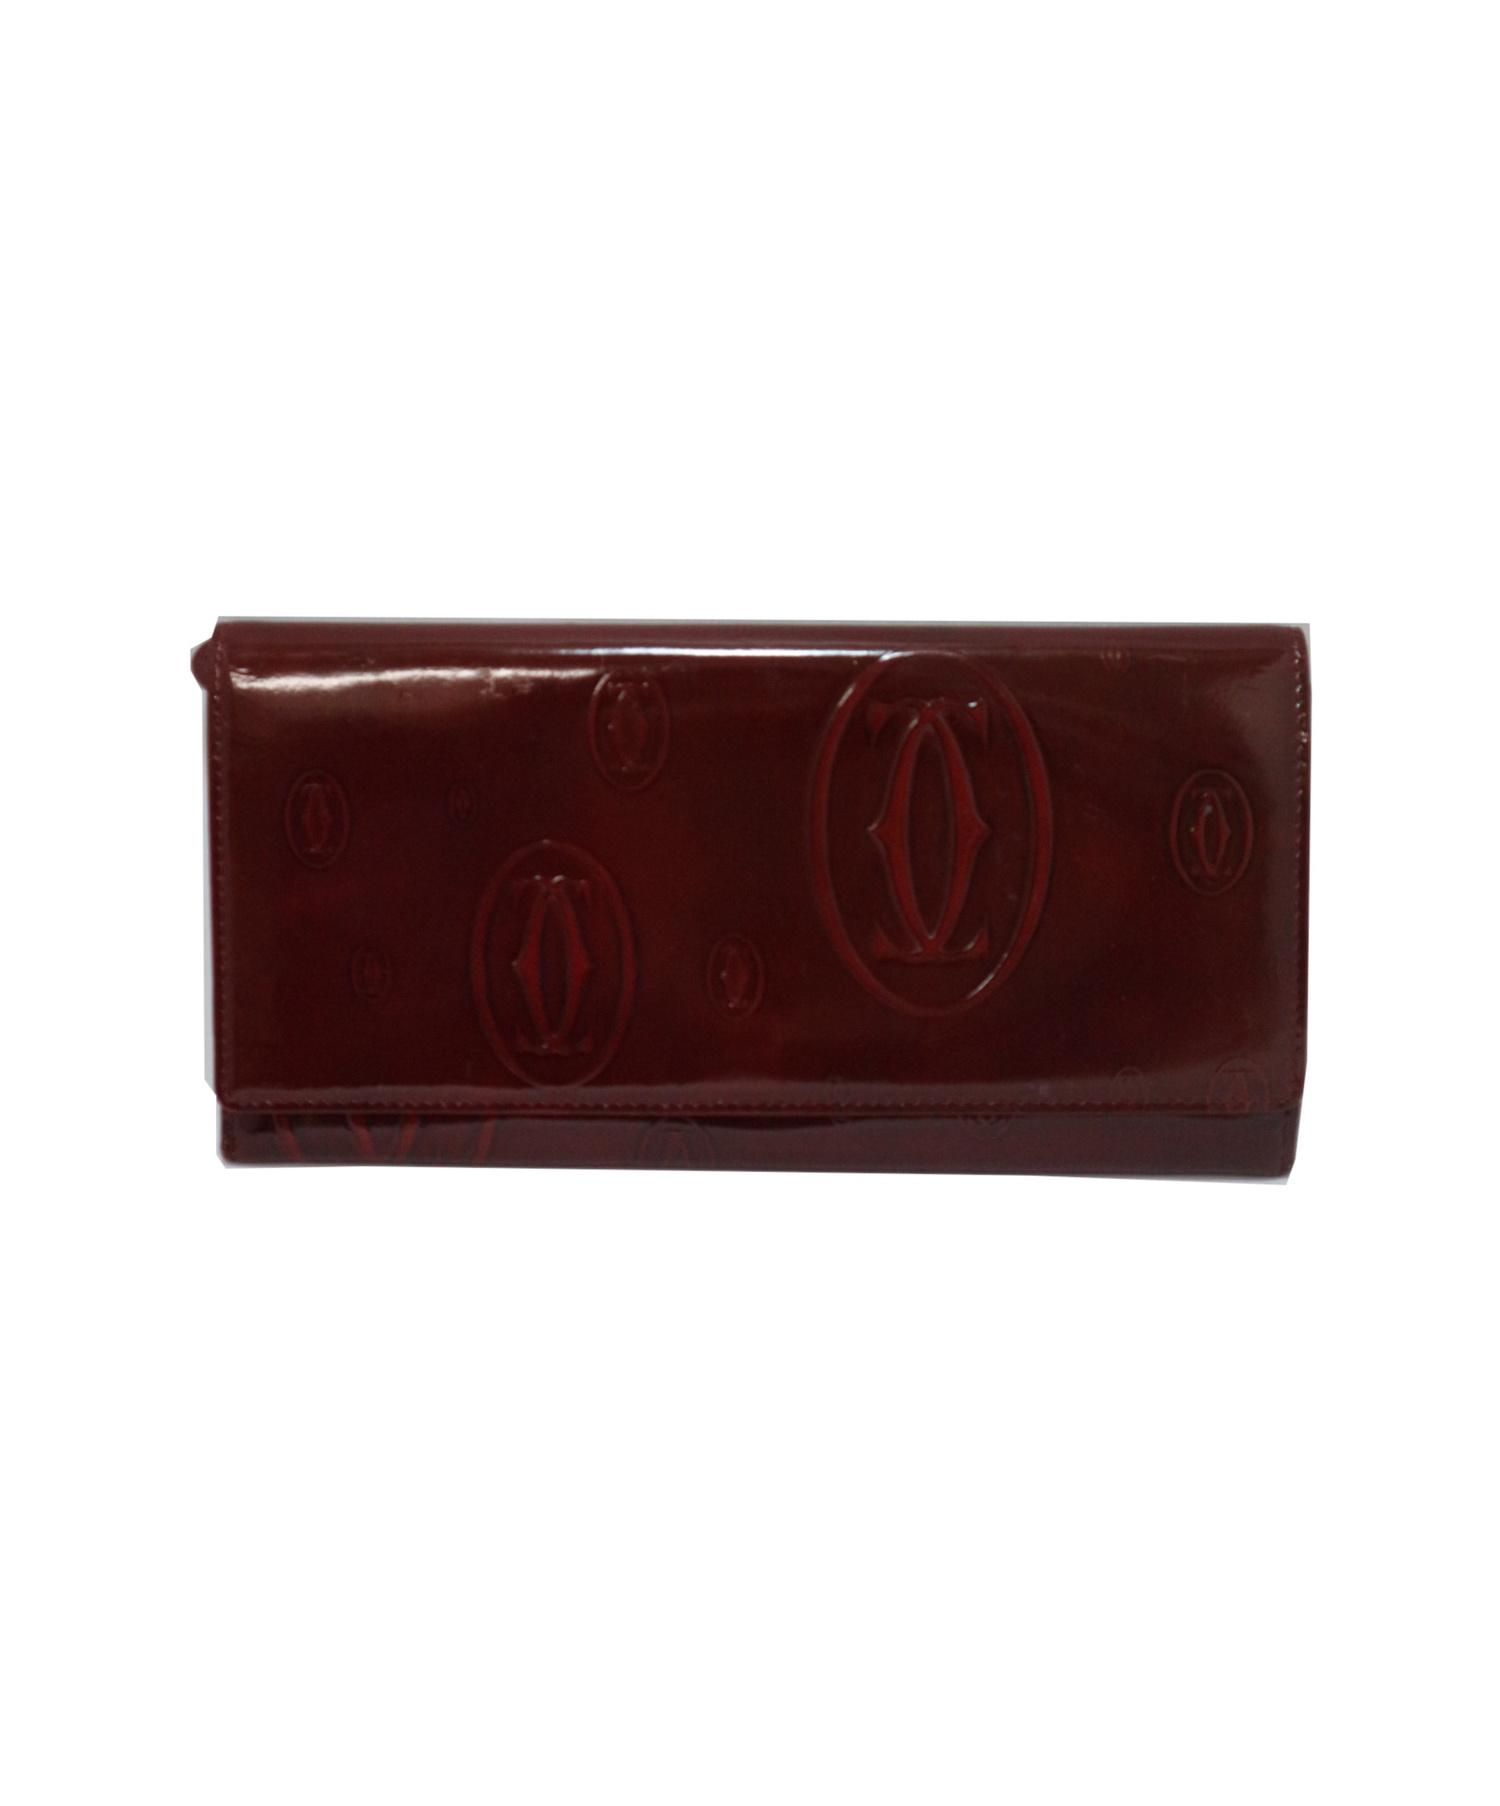 hot sale online 988e3 f965a [中古]Cartier(カルティエ)のレディース 服飾小物 長財布